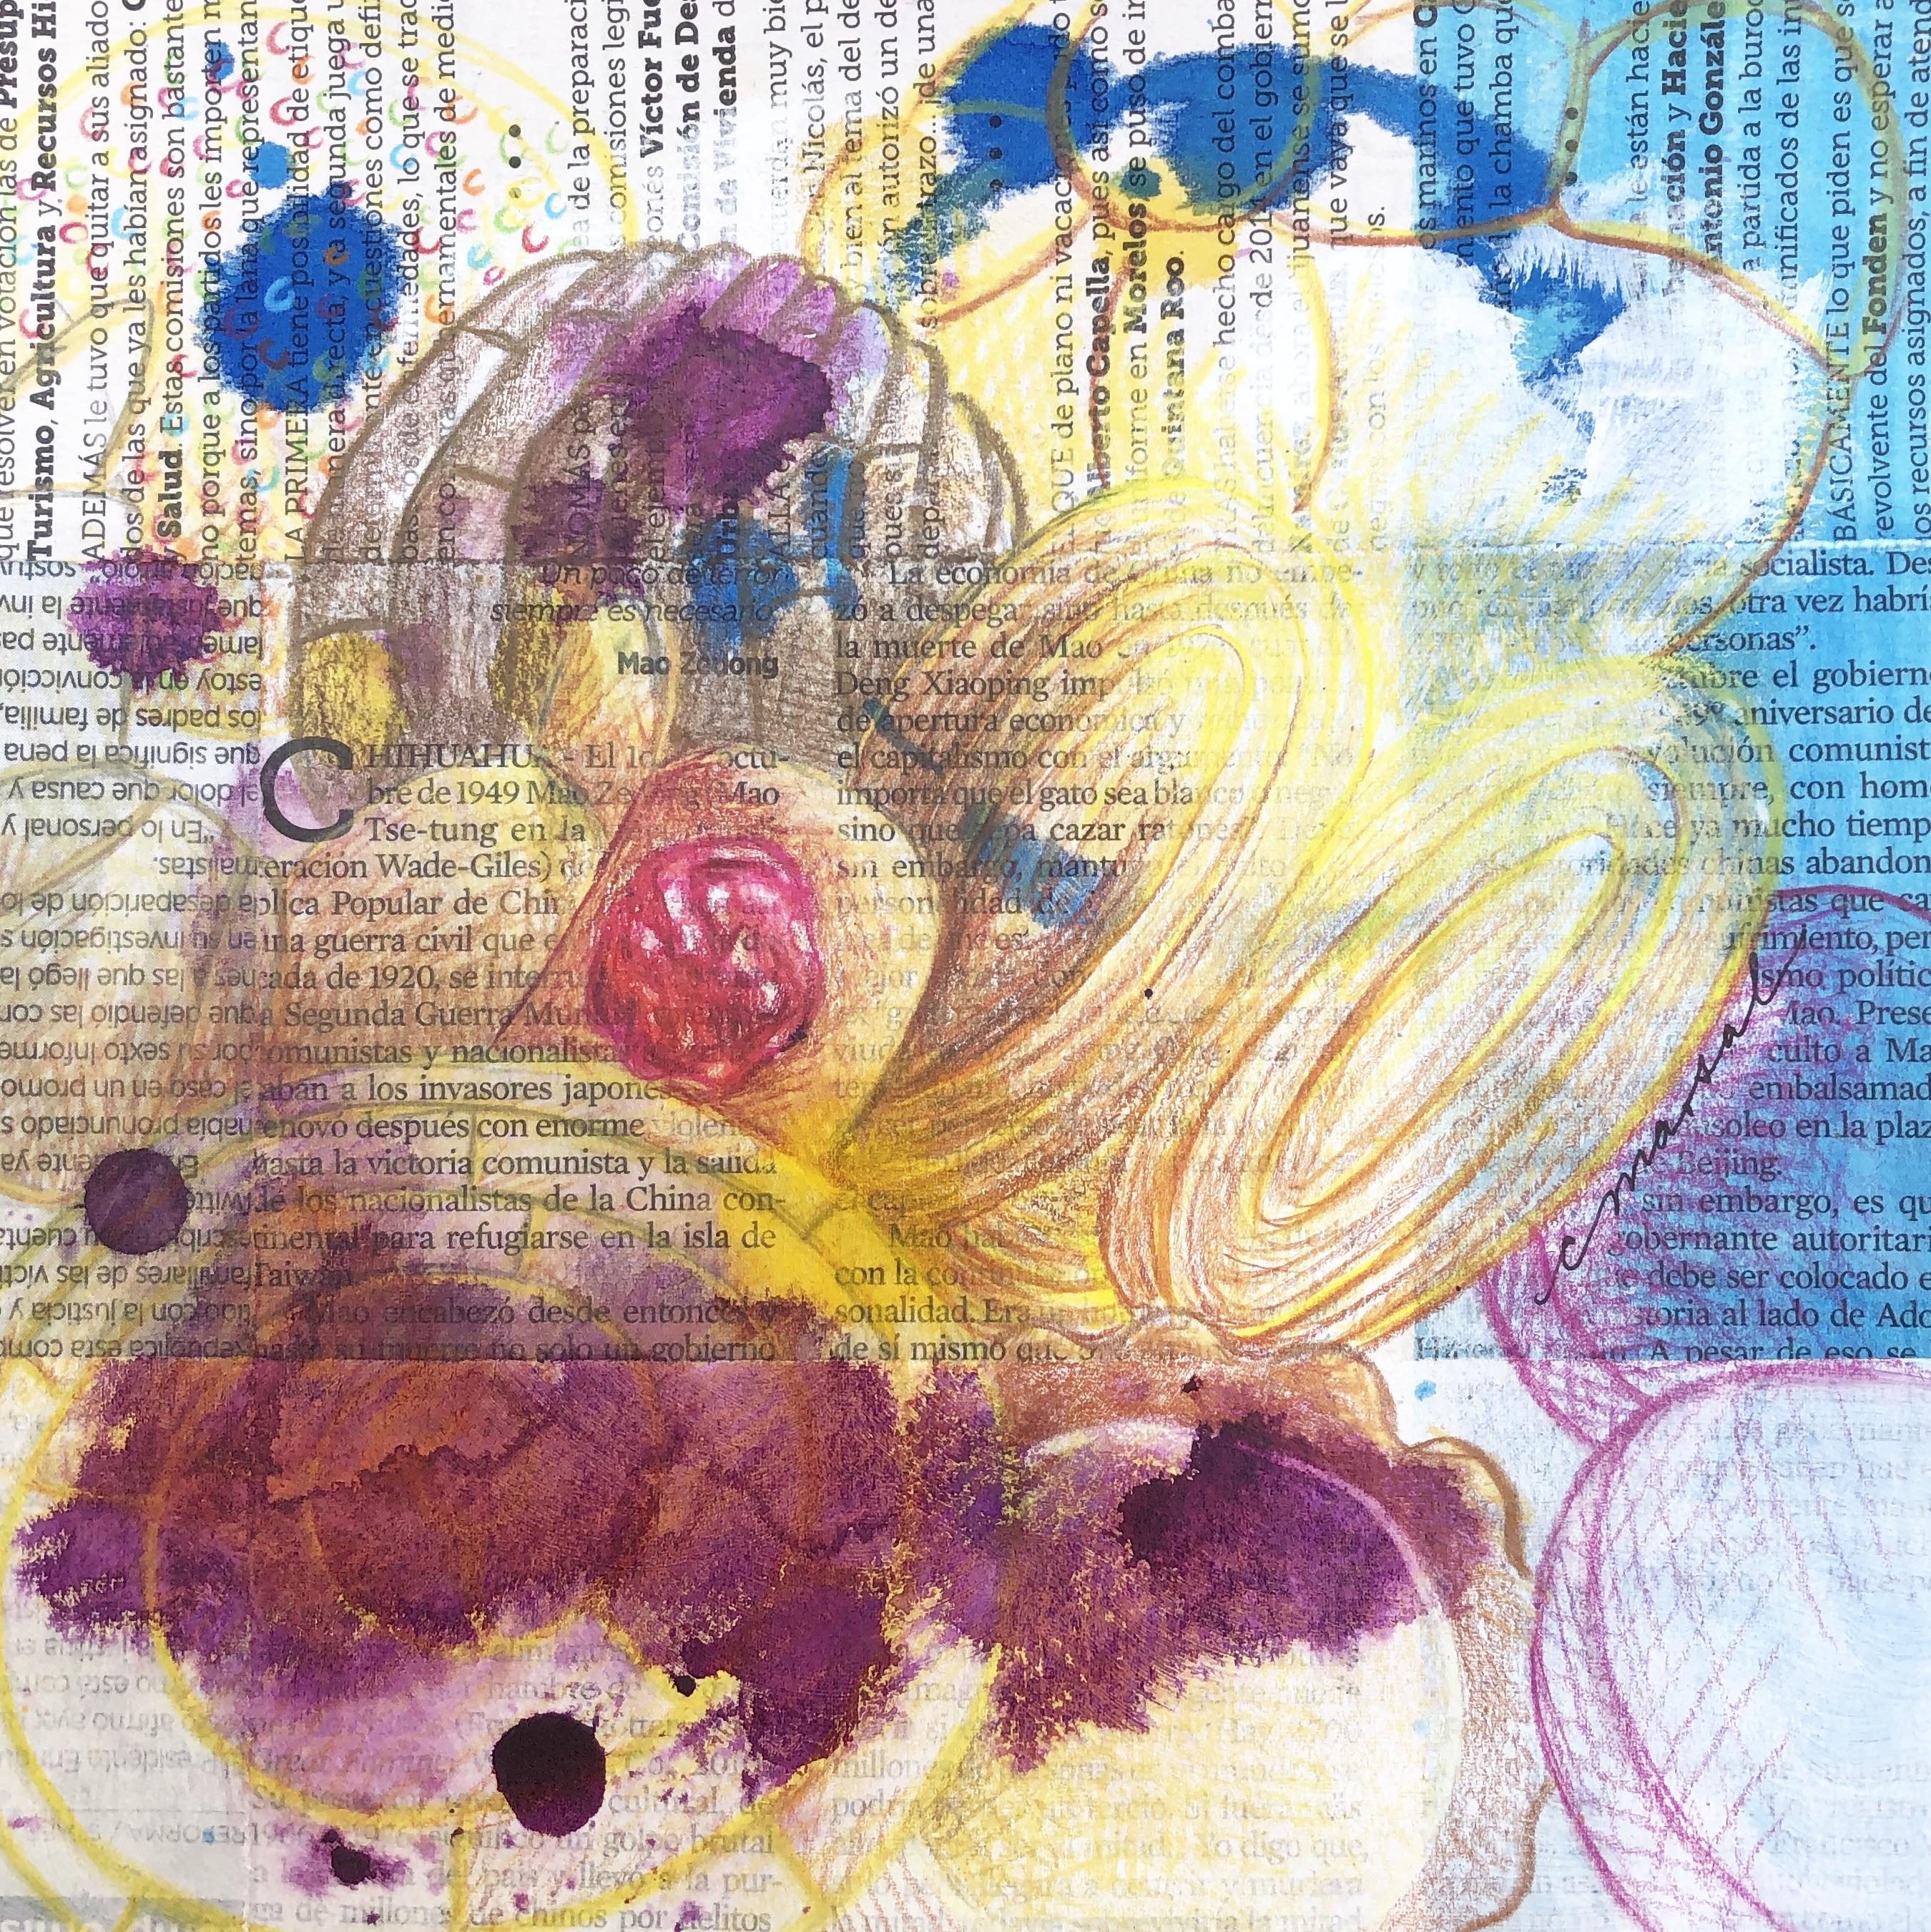 En el Desayuno / During Breakfast - Angeles Salinas - 8'' x 8'' - Mixed Media on Paper